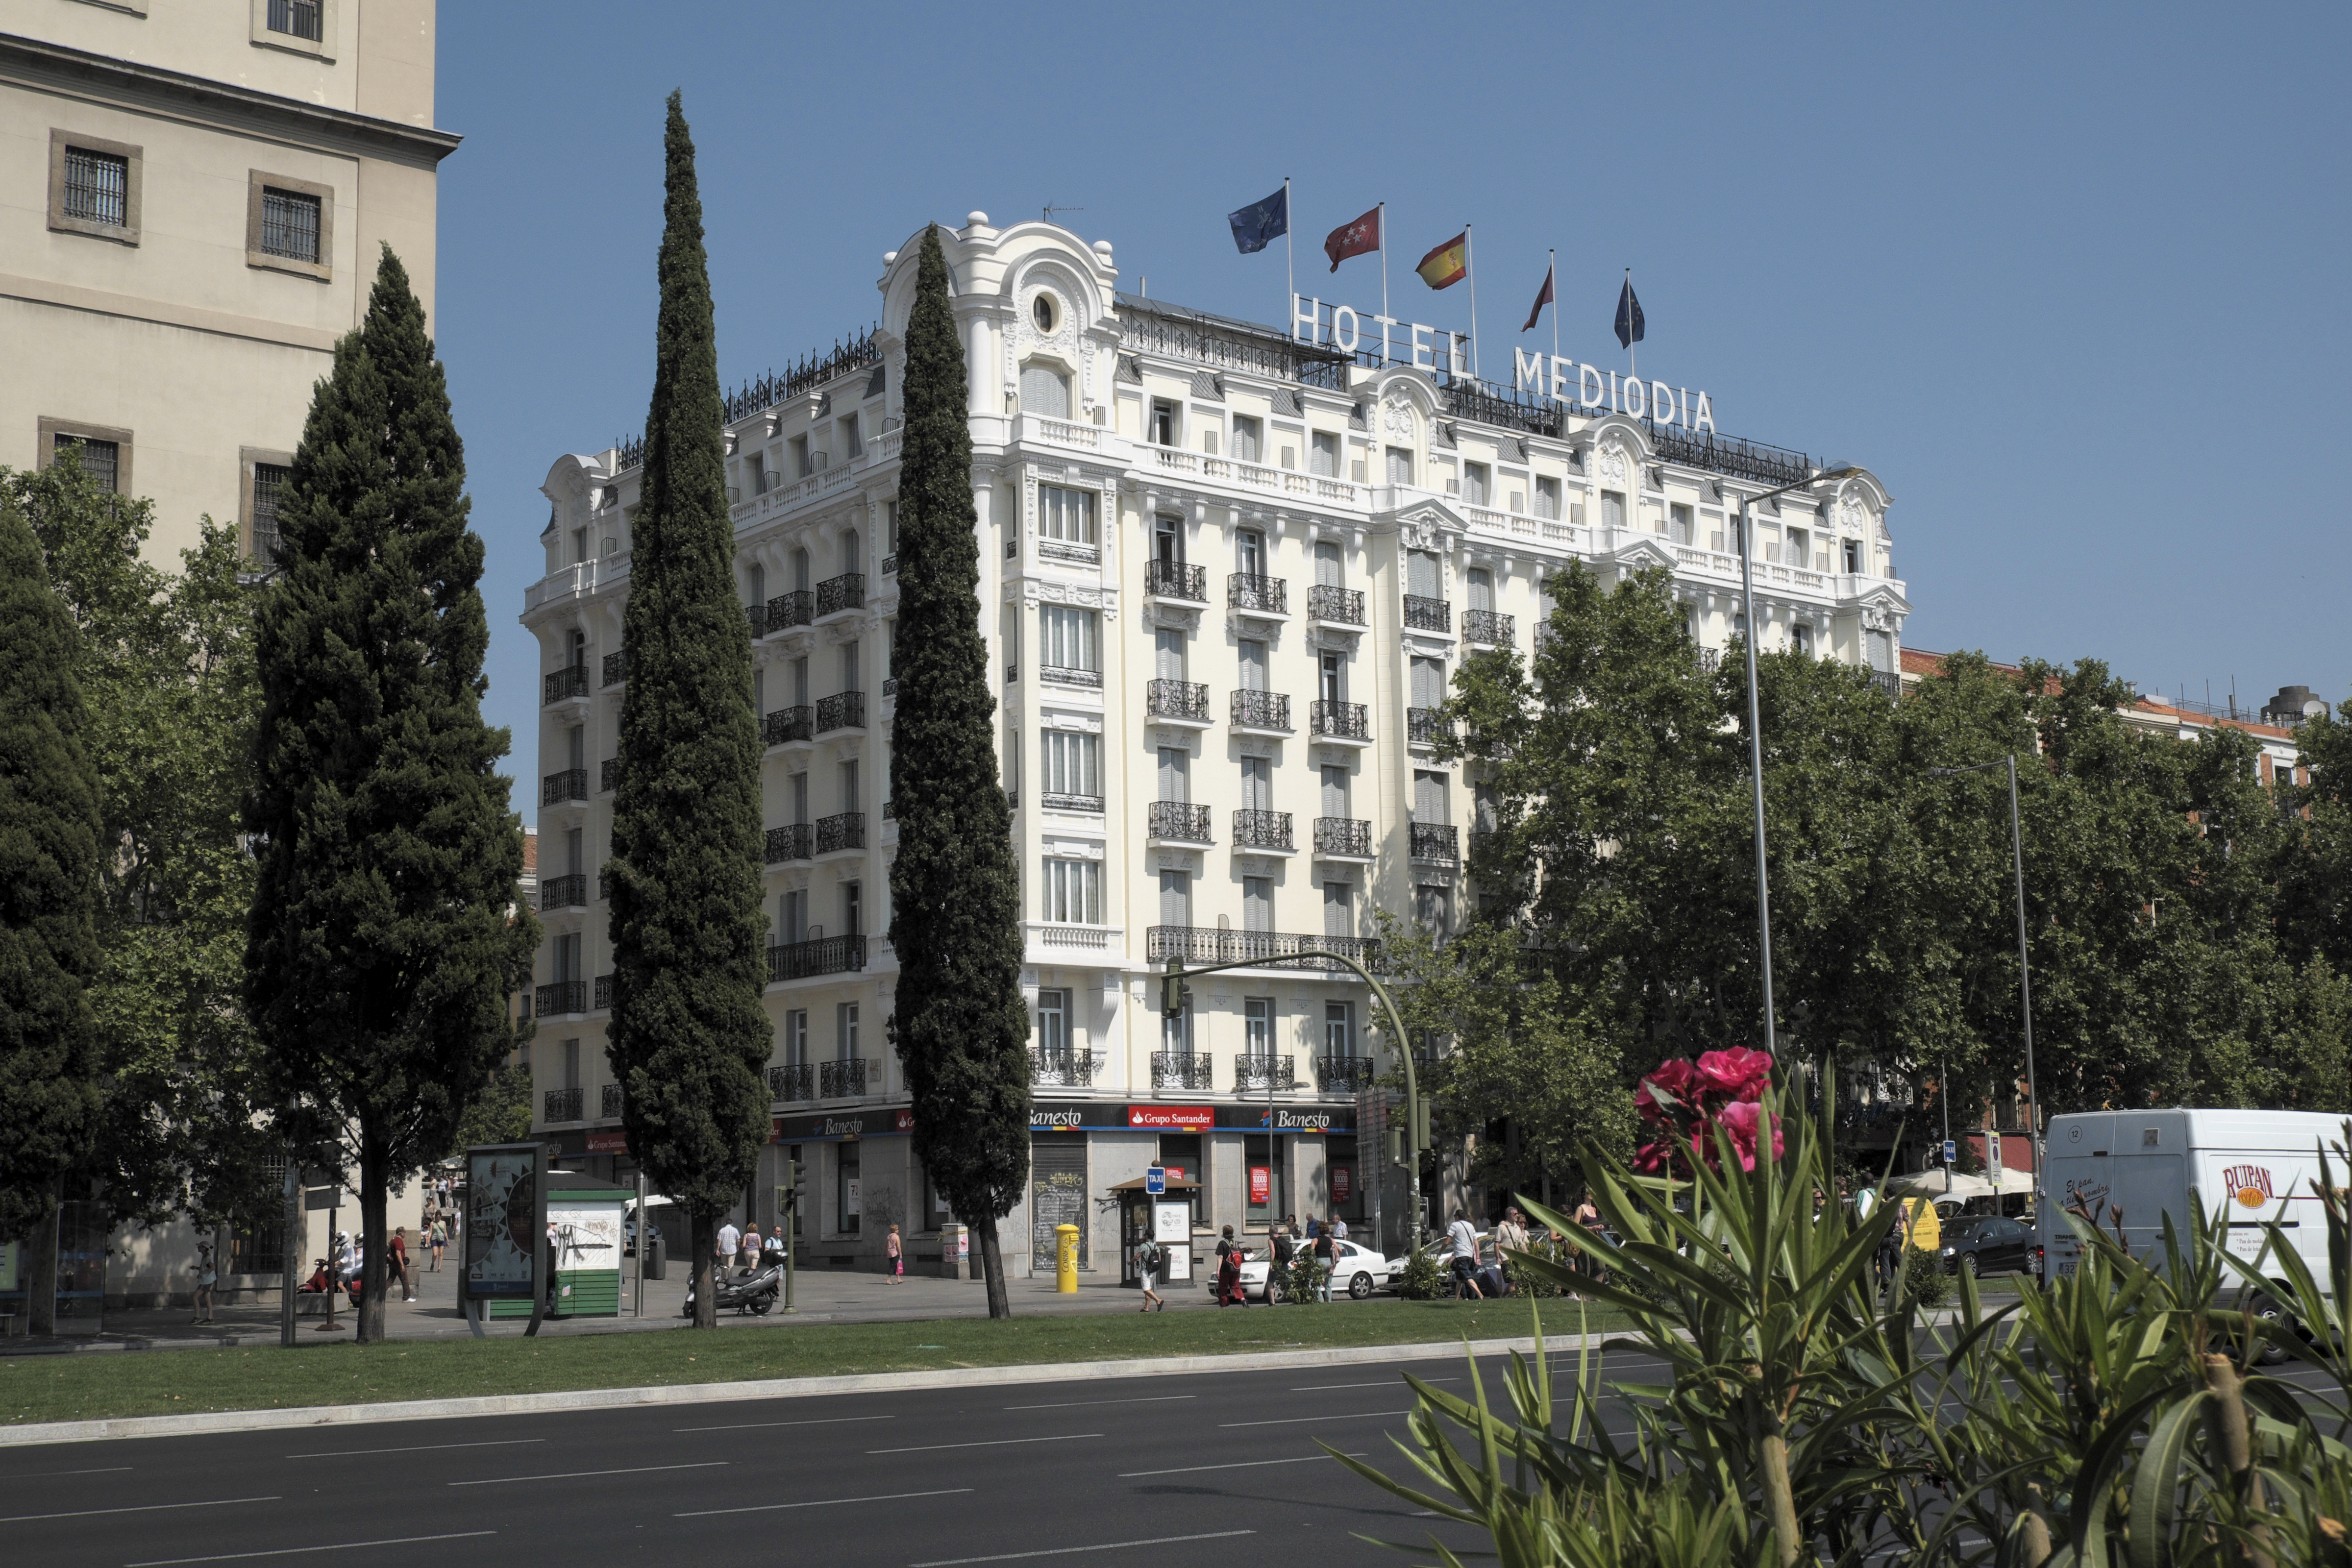 Mediodia Hotel Madrid Hotel Mediodia In Atocha Madrid